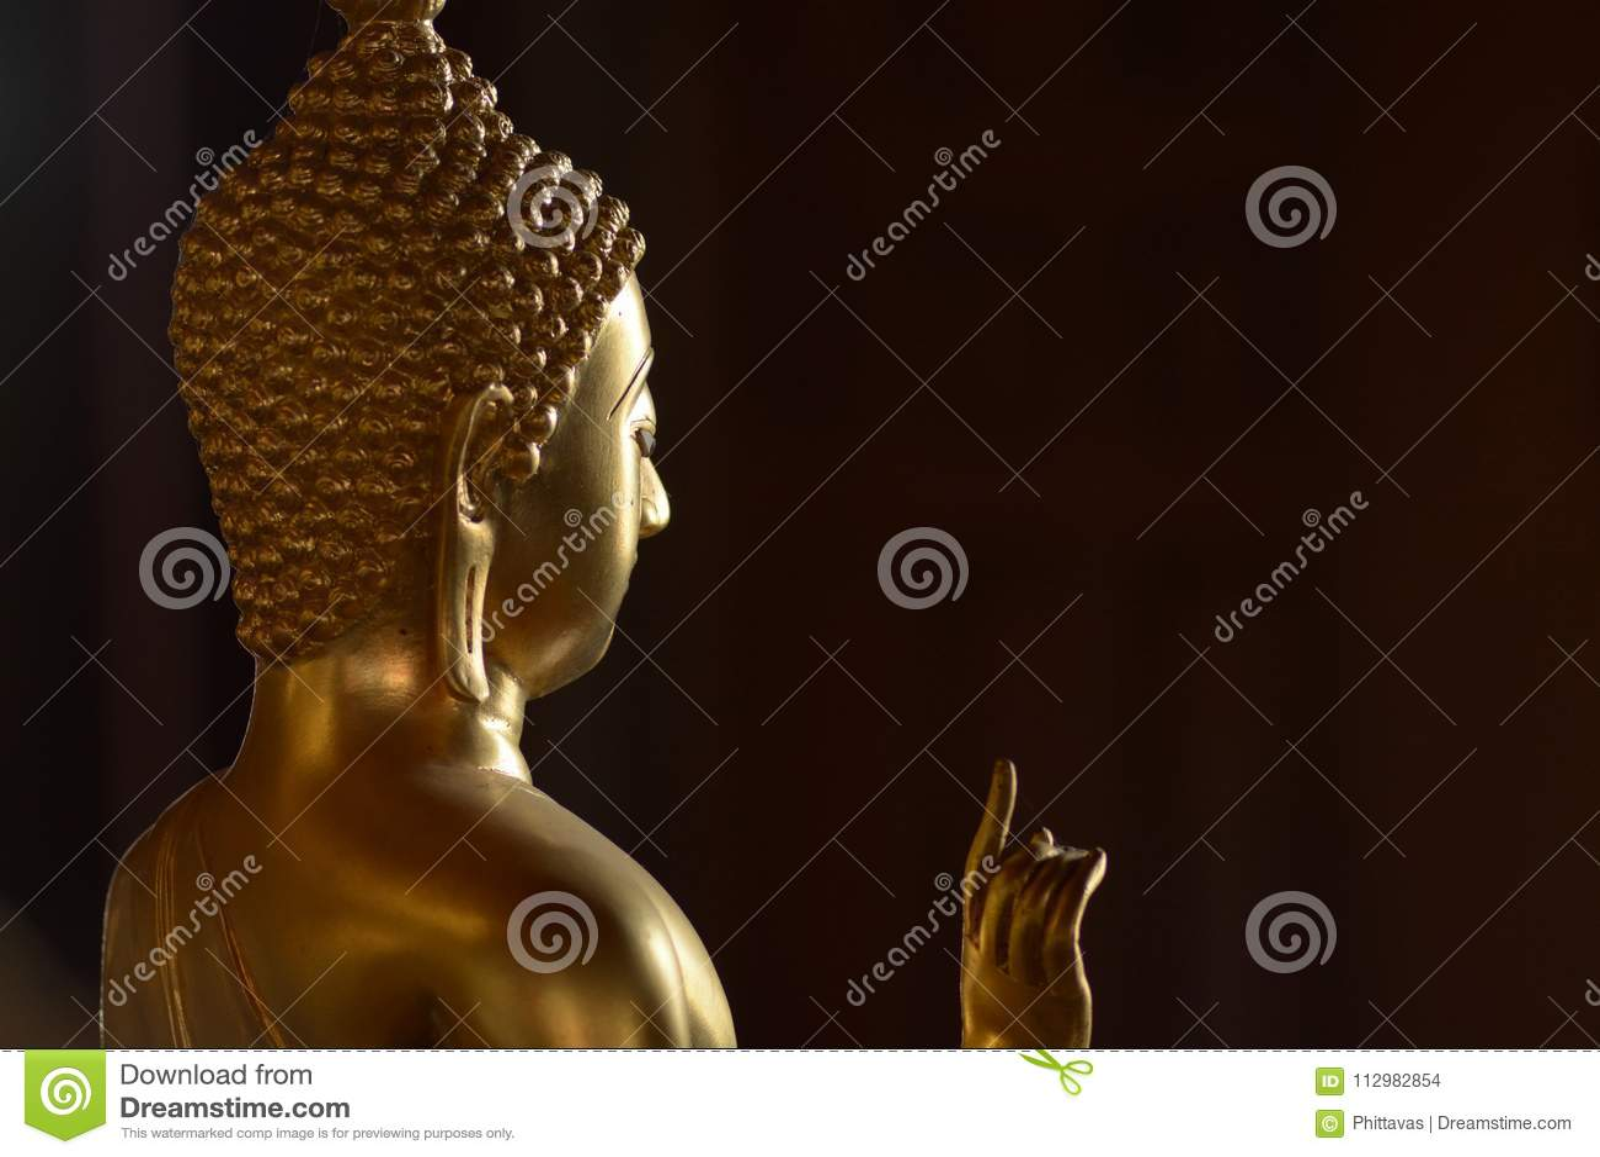 Golden of buddish state in the art style ,Wat Krathum Suea Pla t